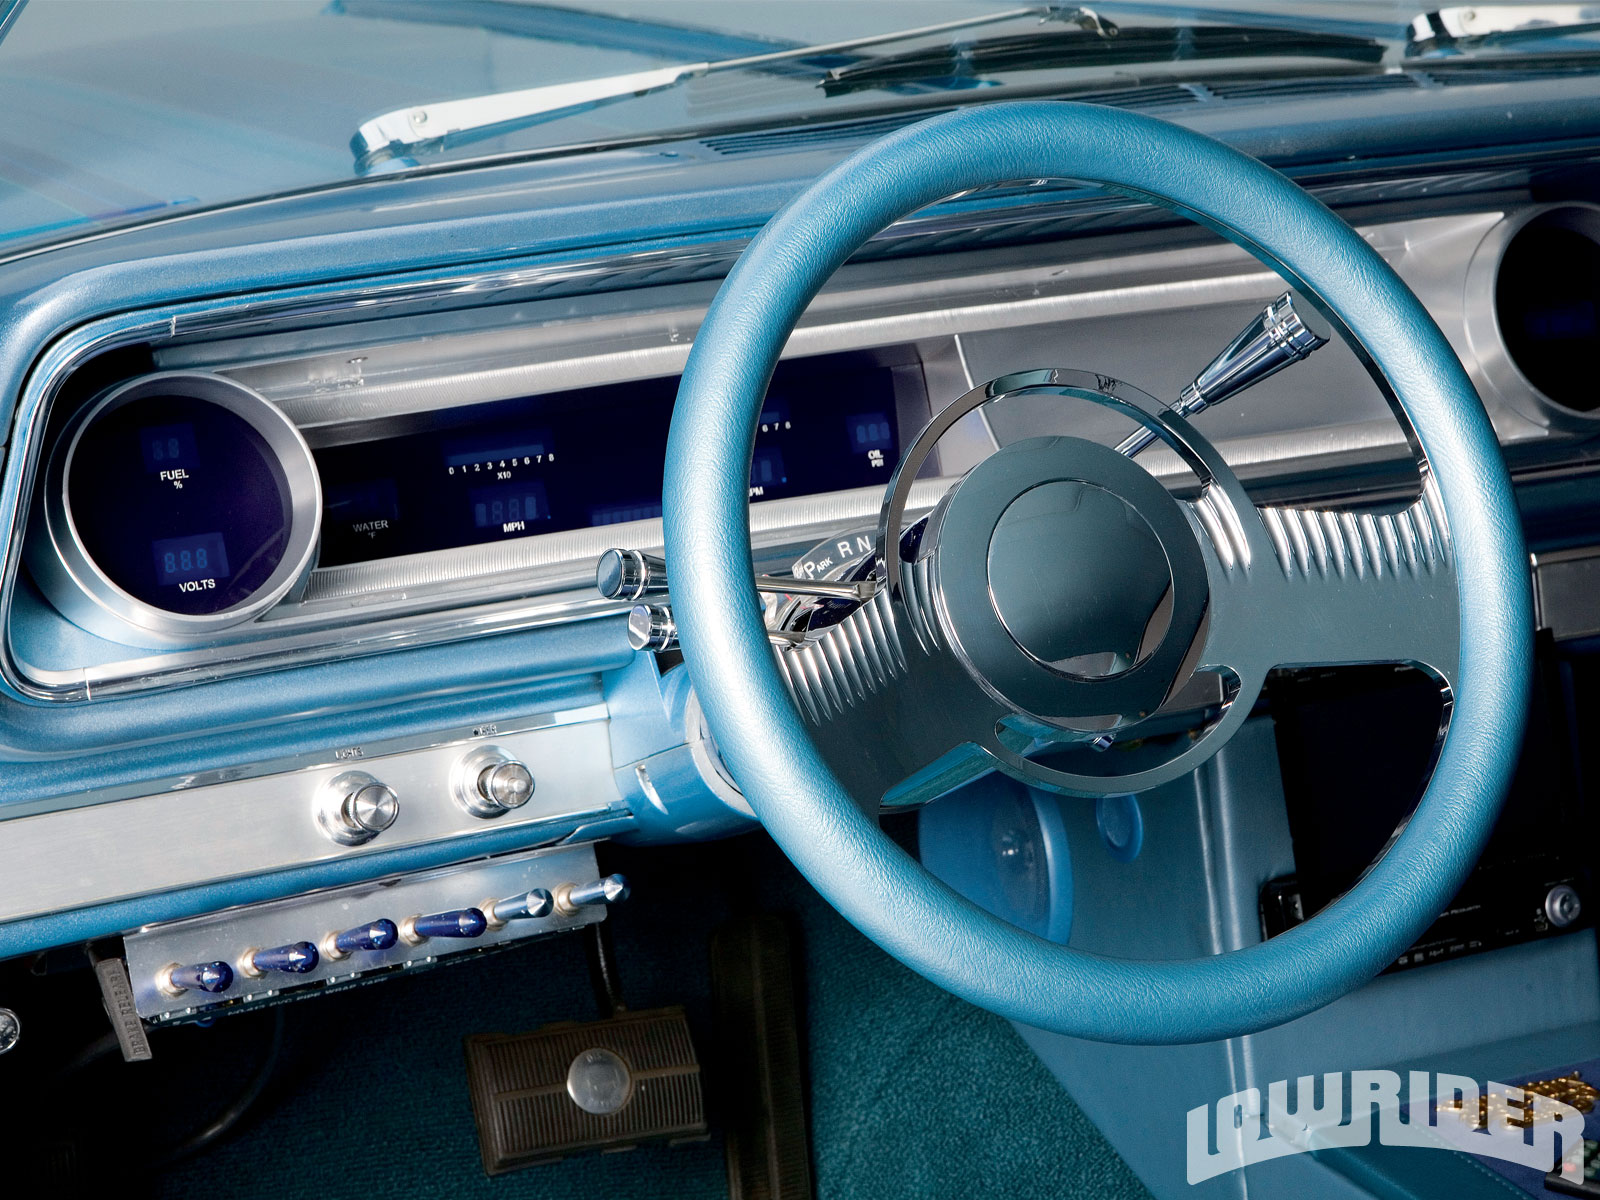 1965 Chevrolet Impala - 1985 Chevy 350 Engine - Lowrider ...